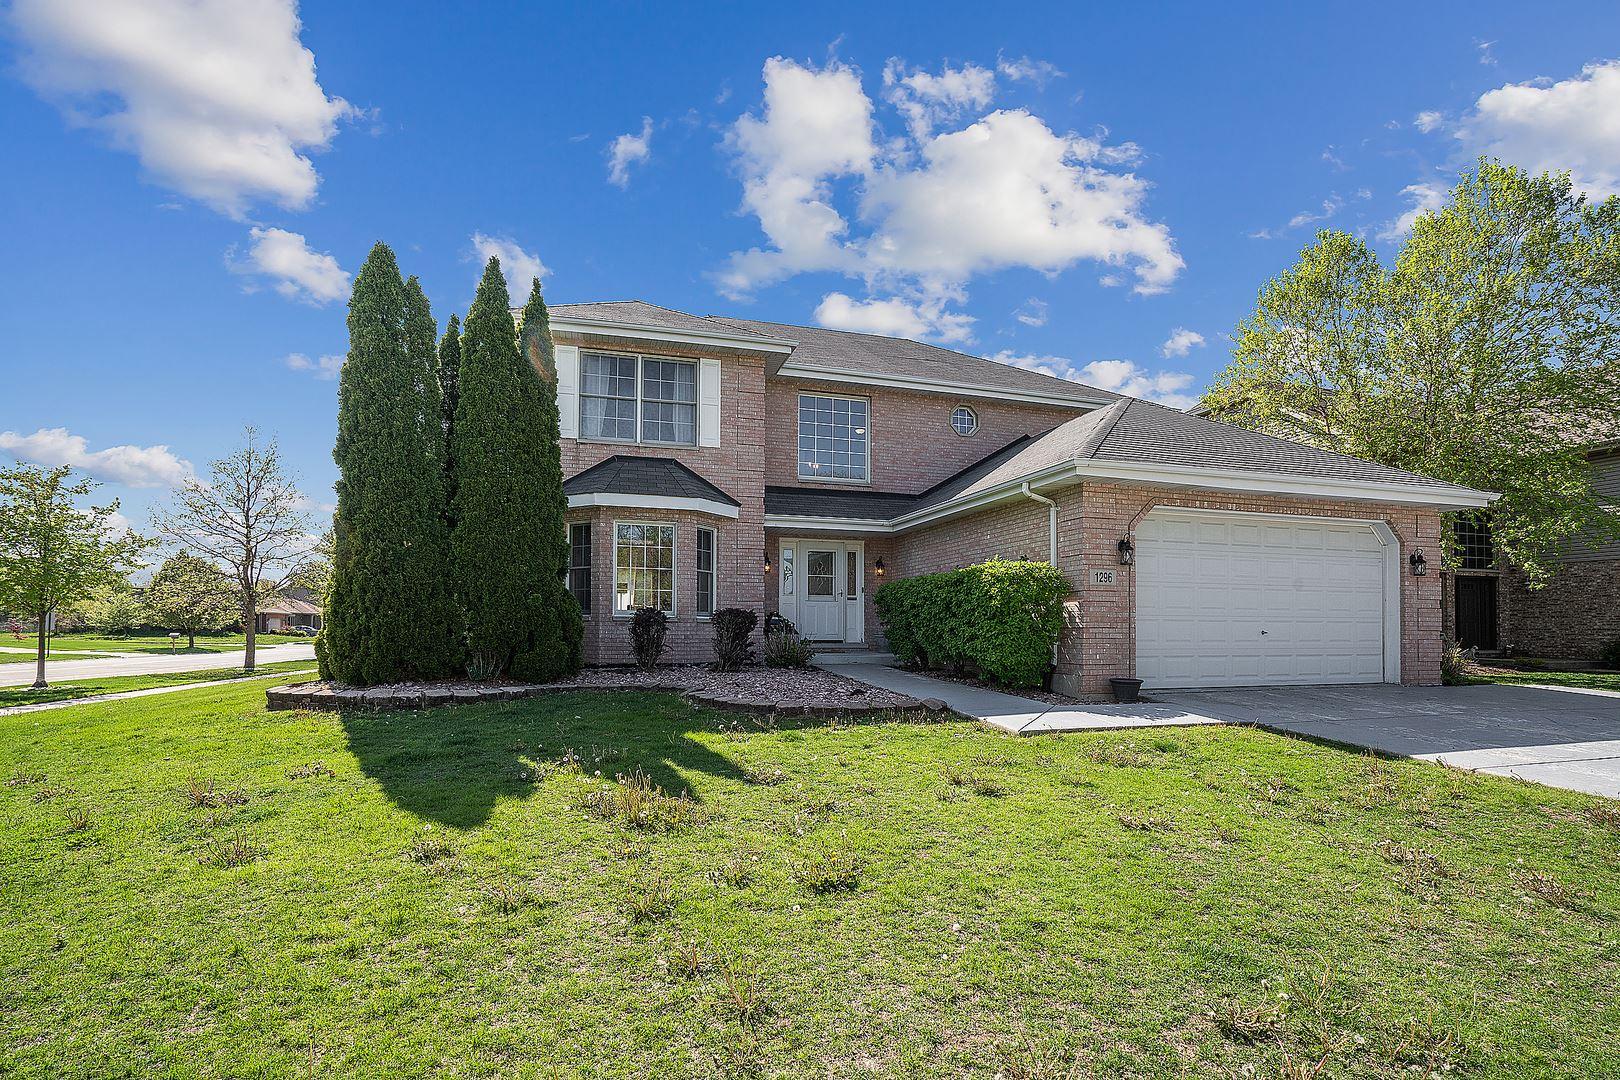 1296 Woburn Drive, Lemont, IL 60439 - MLS#: 11243198